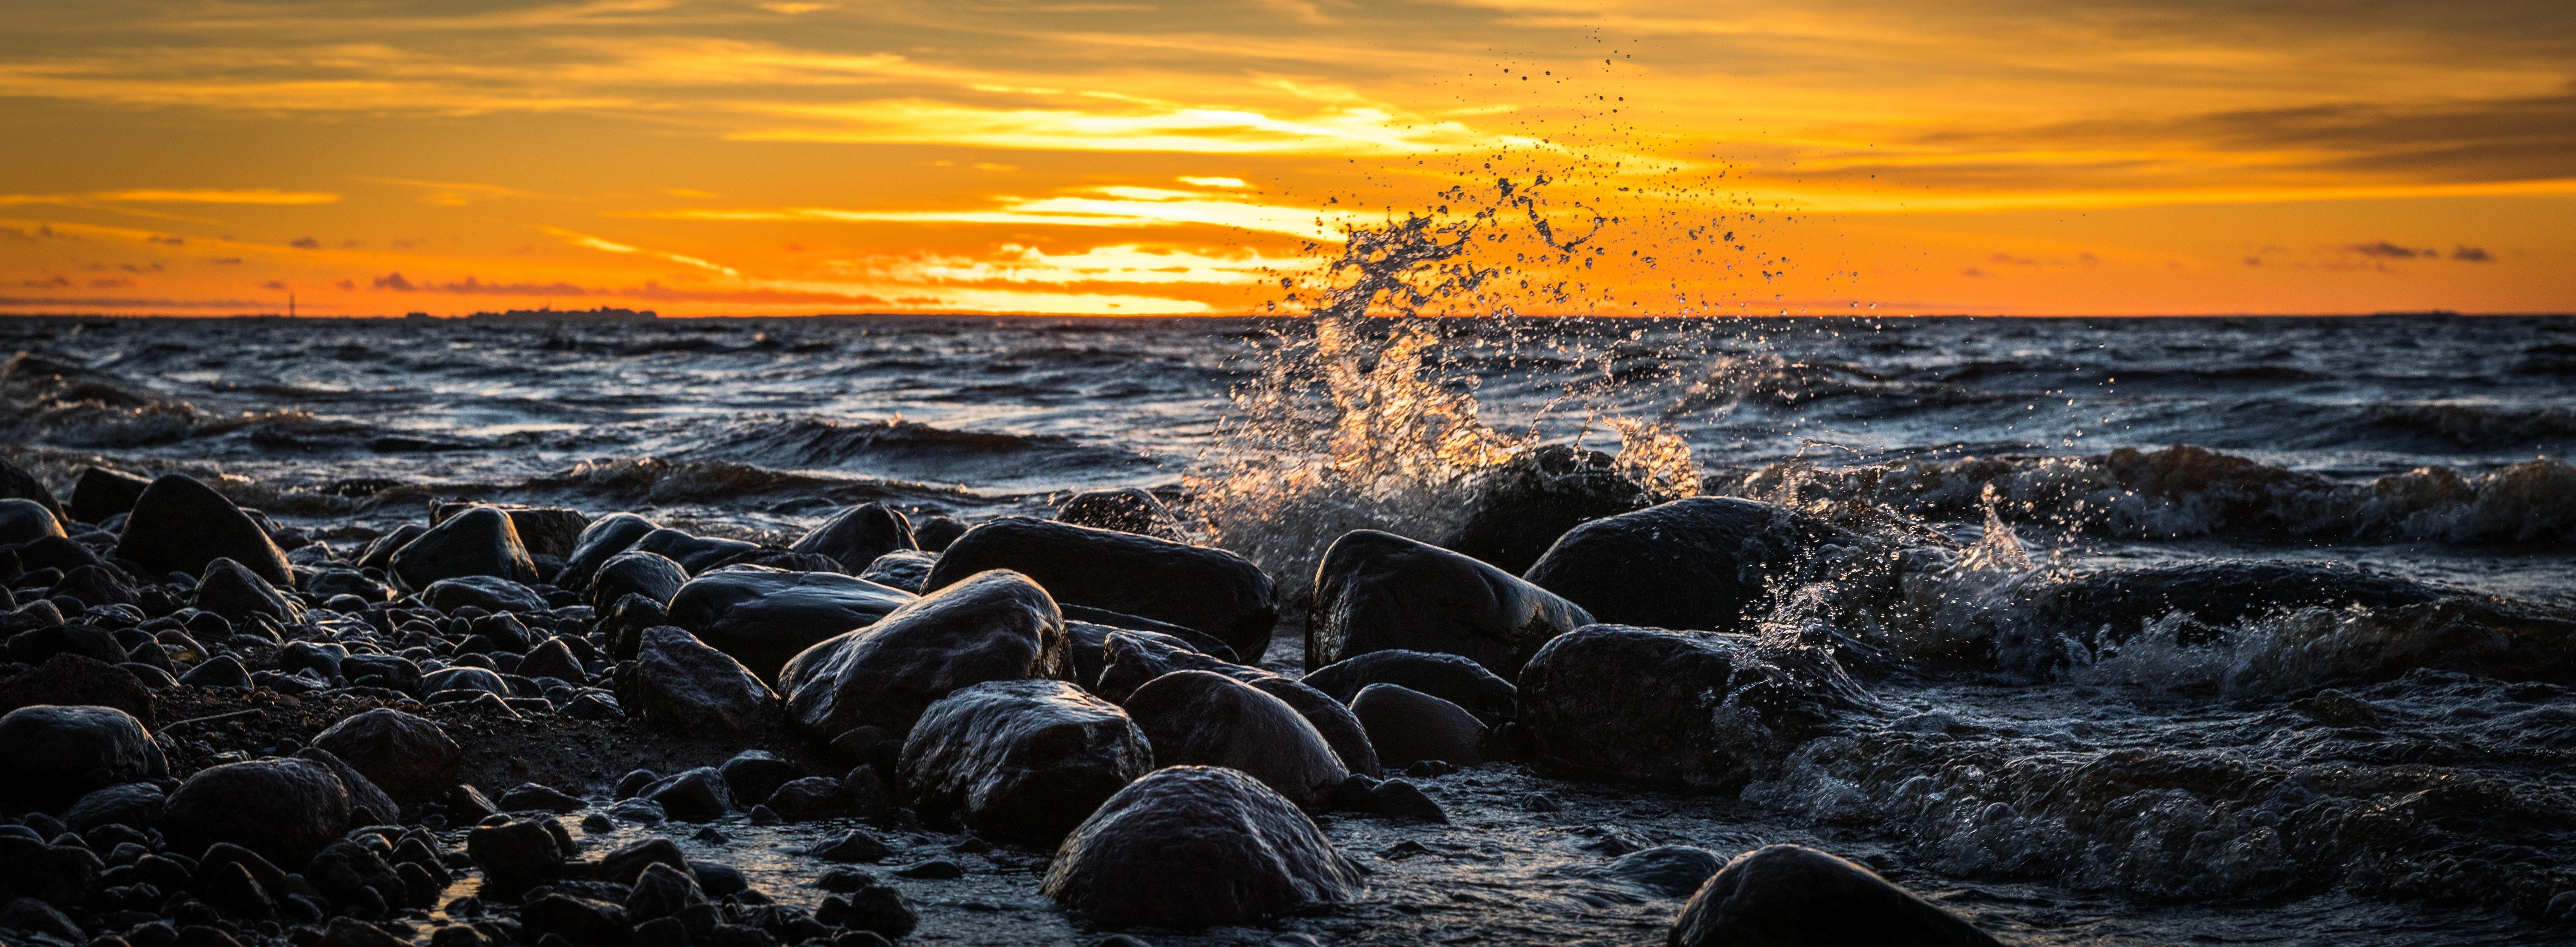 Waves splashing at stones on beach during sunset photo